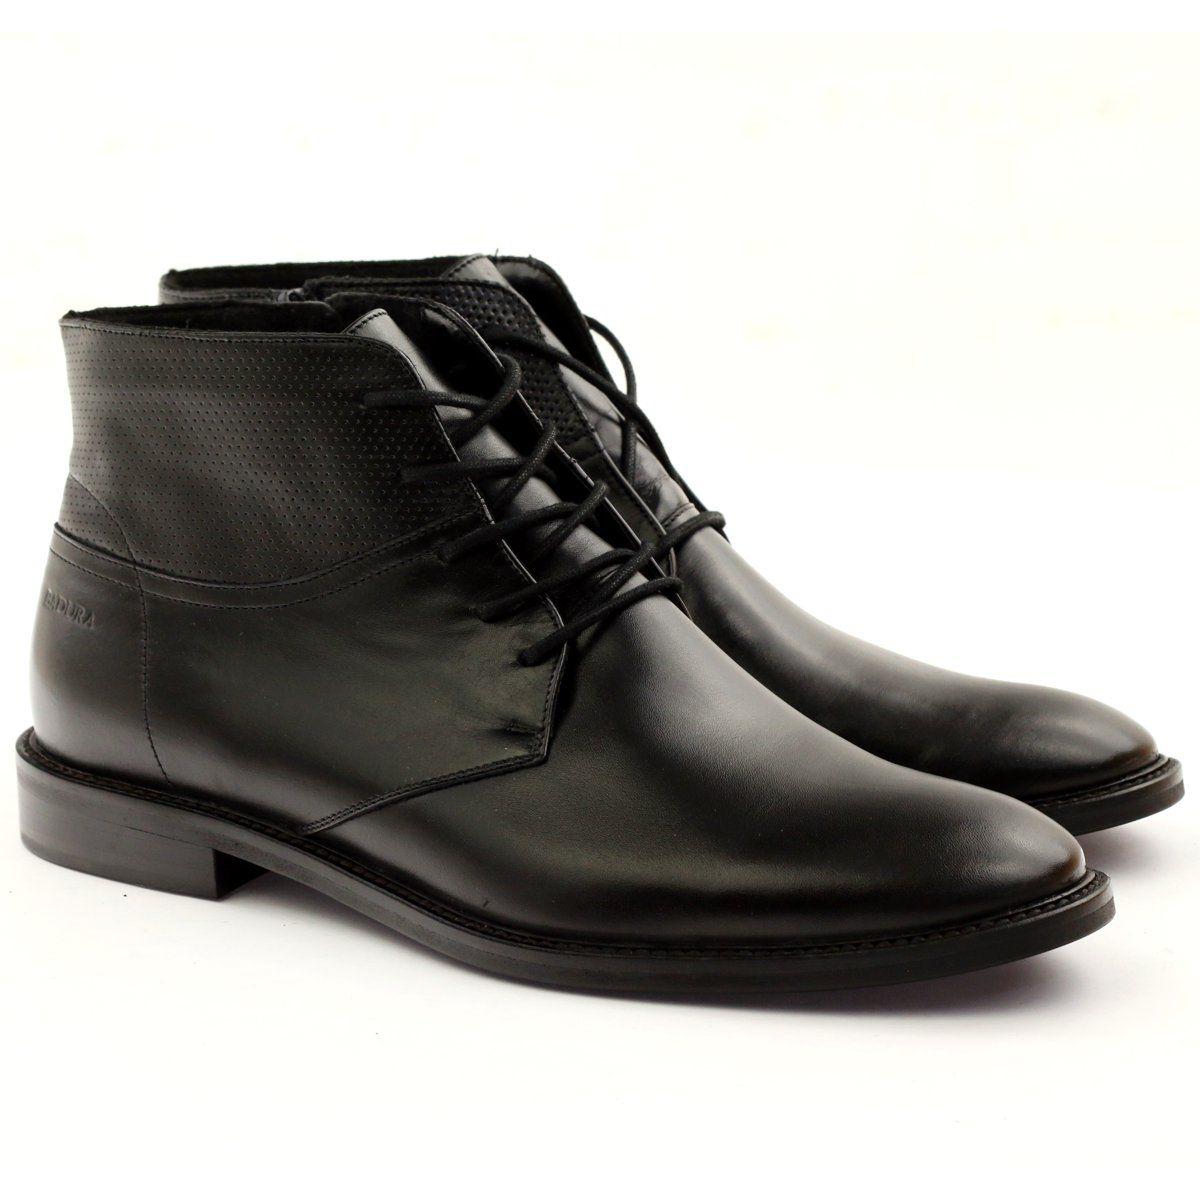 Trekkingowe Meskie Badura Botki Trzewiki Zimowe Badura 5258 Czarne Mens Boots Fashion Boots Men Chukka Boots